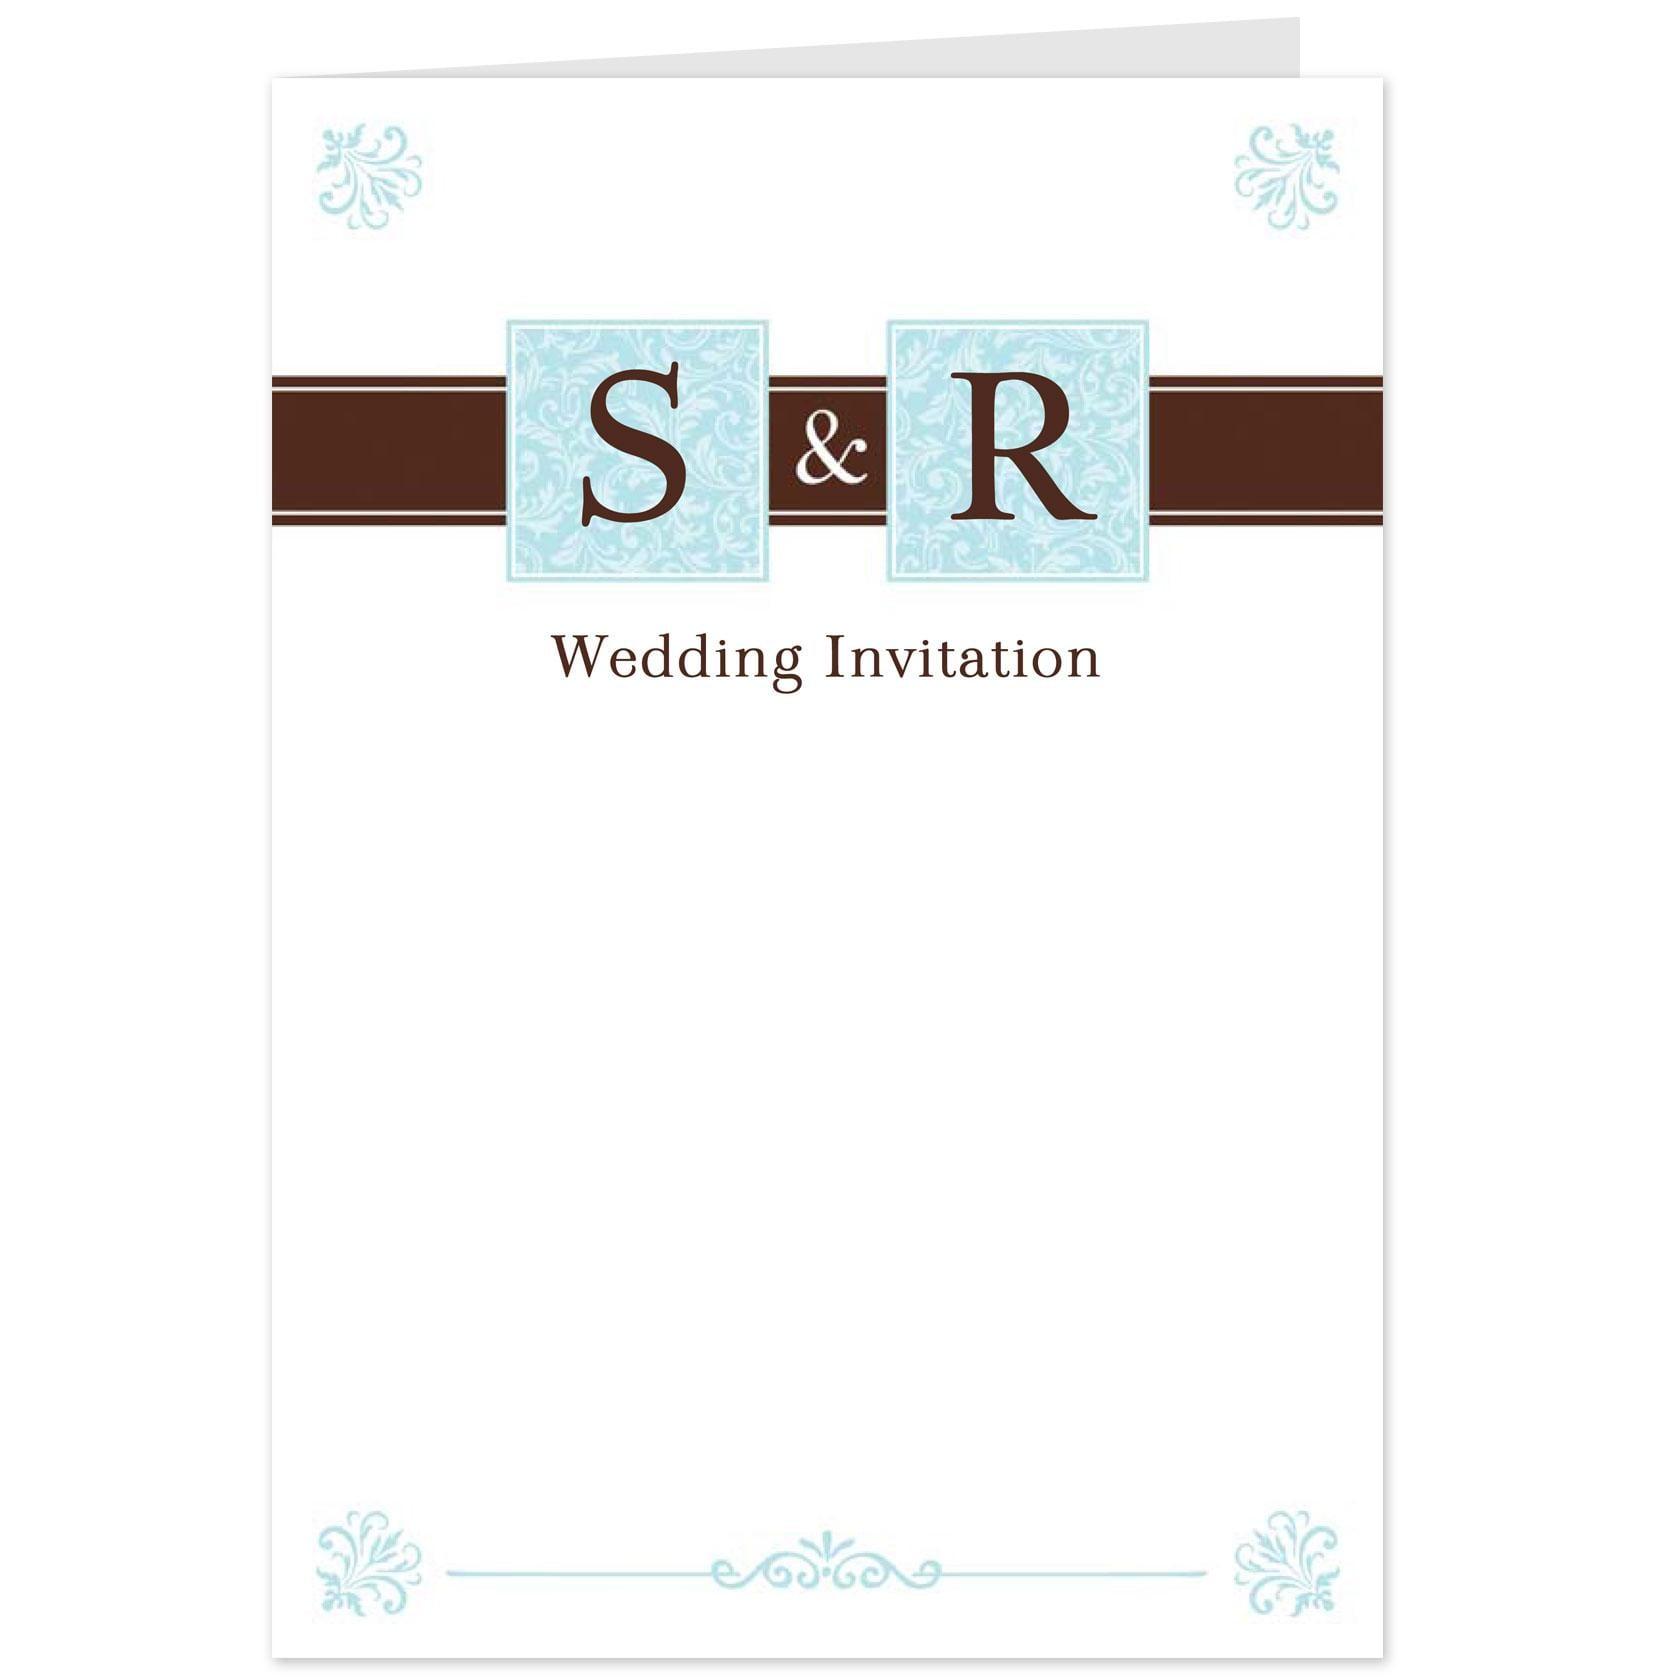 hallmark wedding reception invitations hallmark wedding invitations hallmark wedding hallmark wedding invitation hallmark